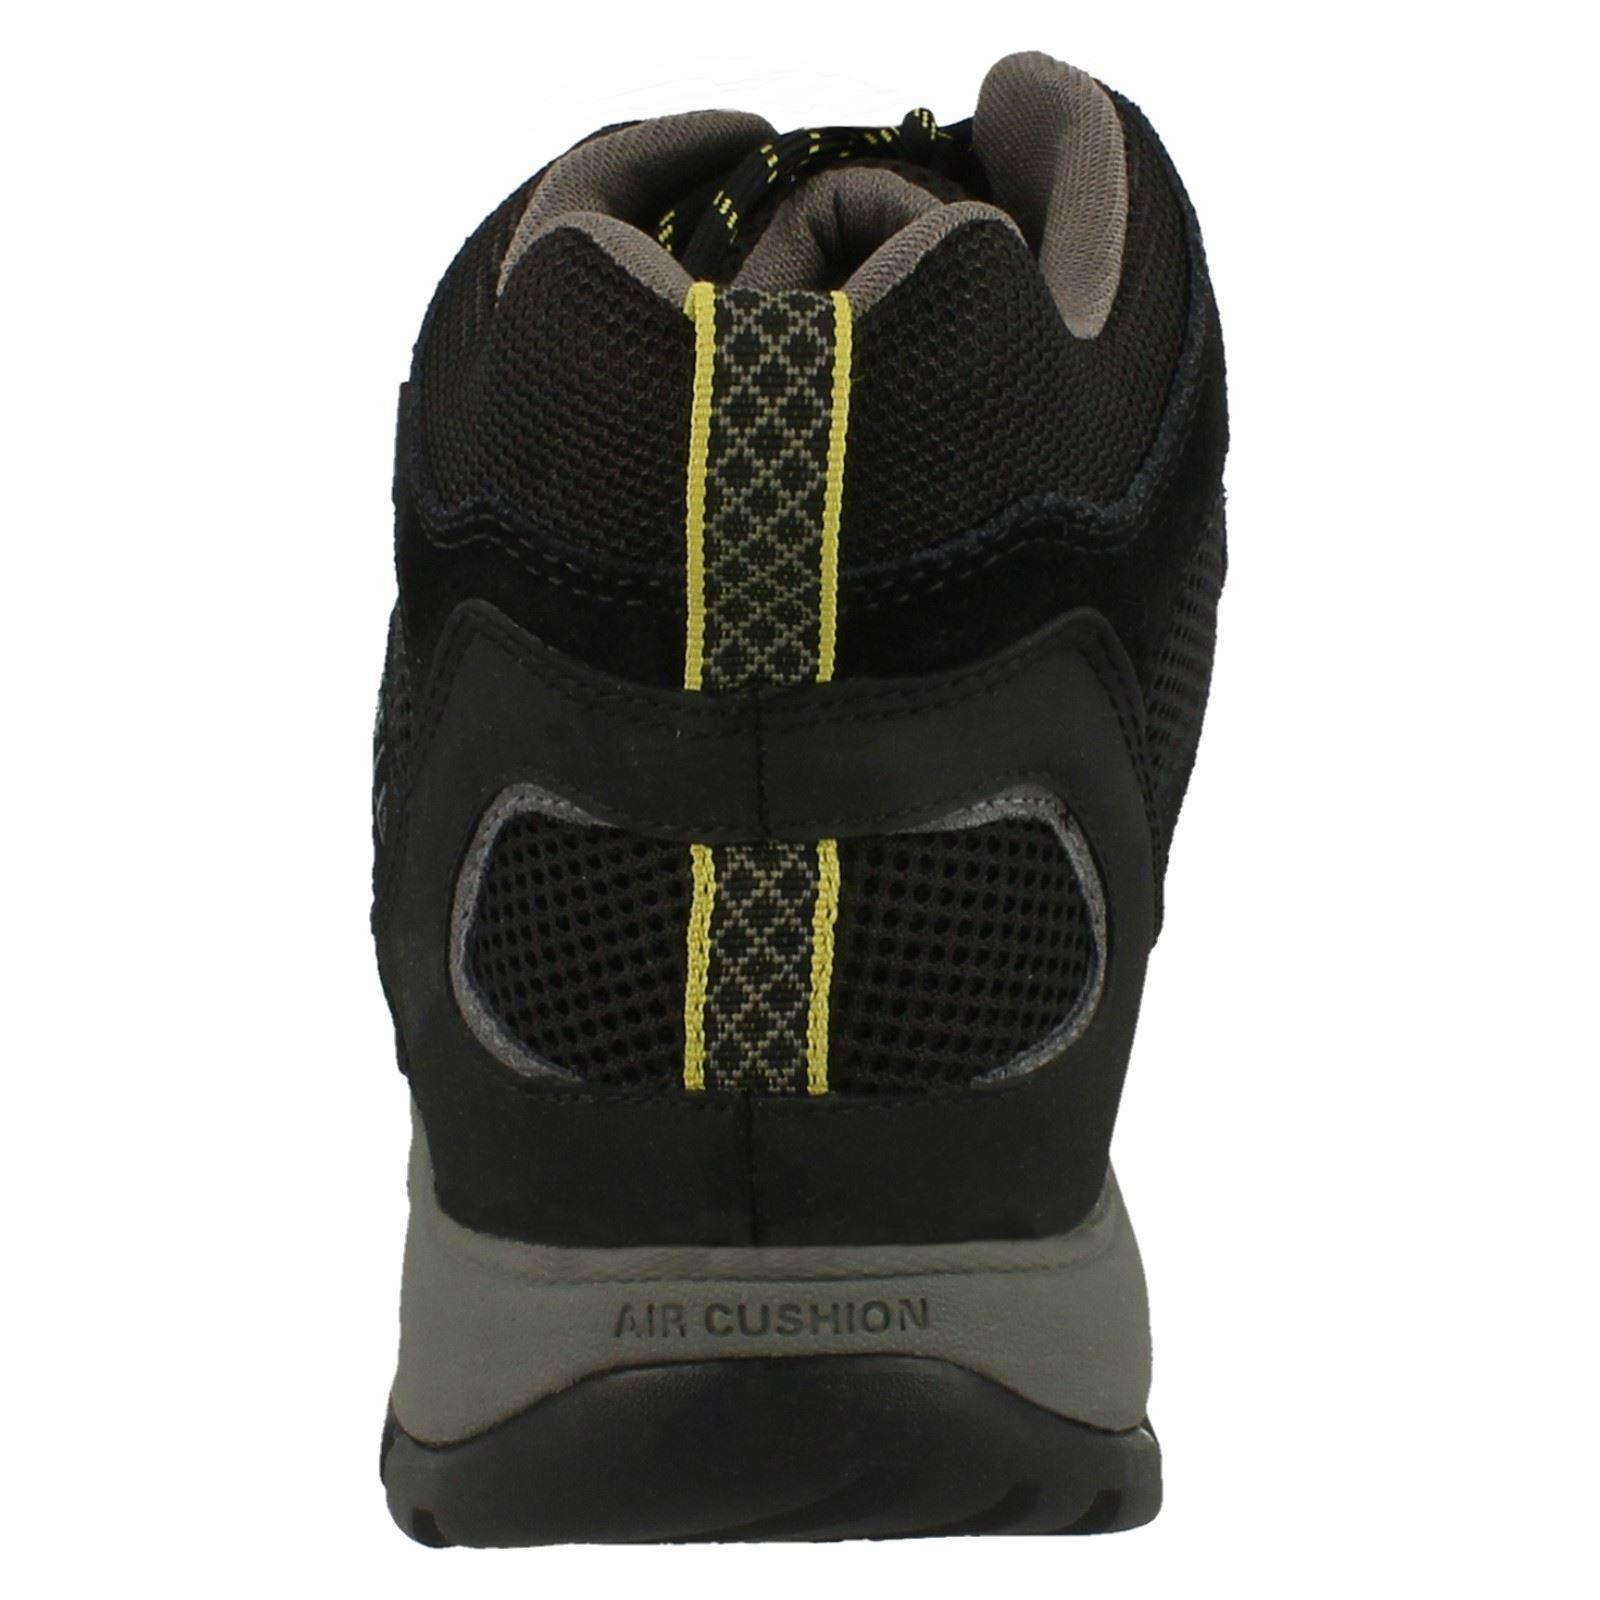 thumbnail 6 - Mens-Merrell-Waterproof-Walking-Boots-Phoenix-Mid